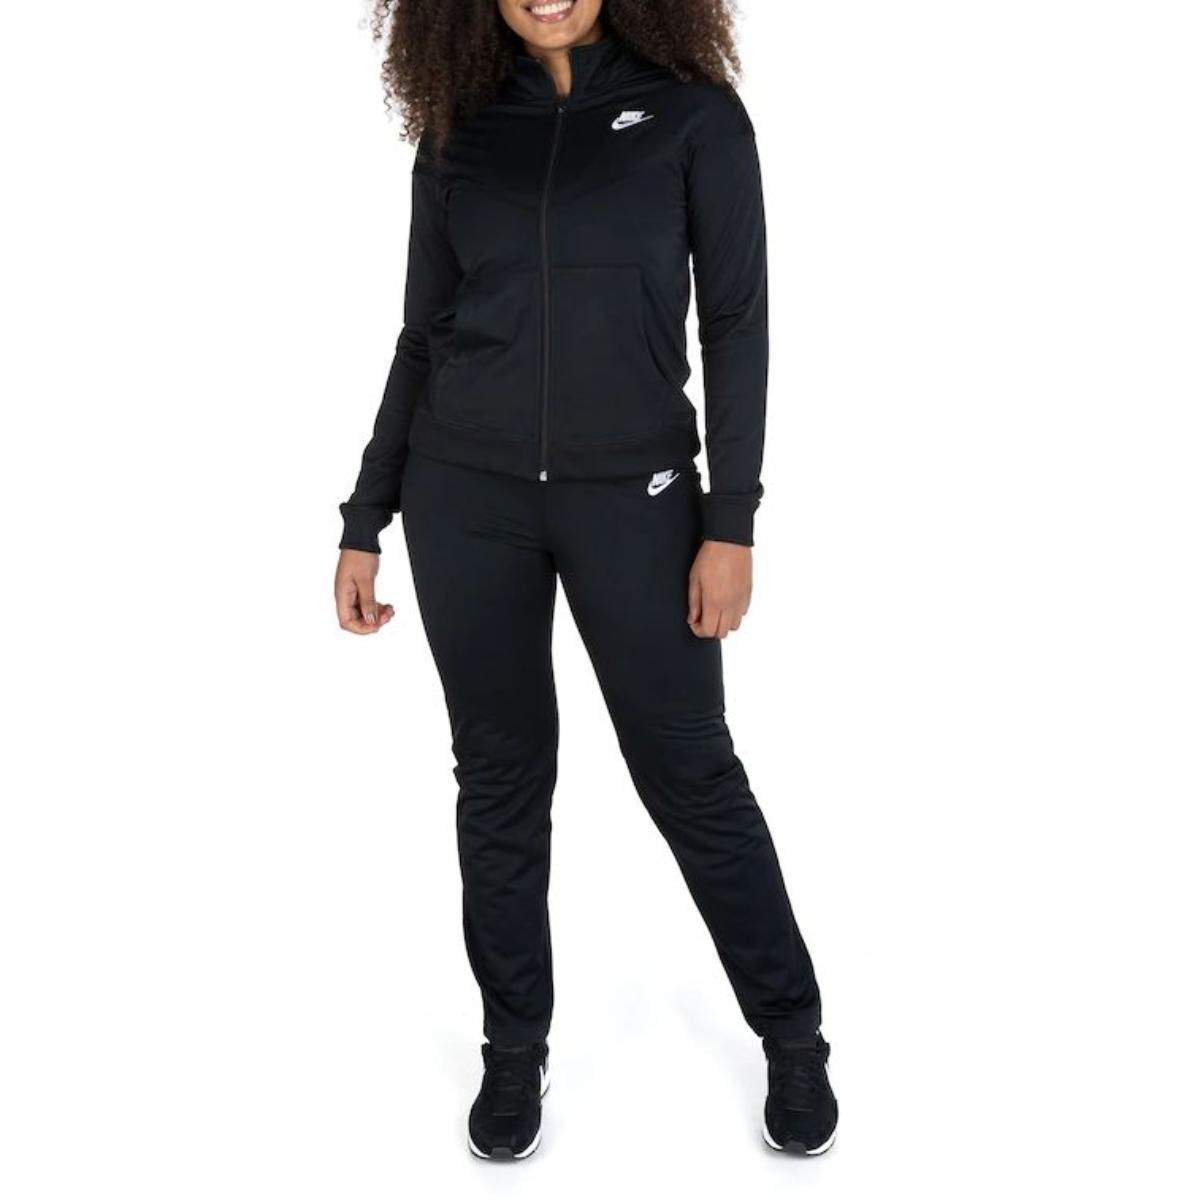 Abrigo Feminino Nike Bv4958-011  Trk Suit pk Preto